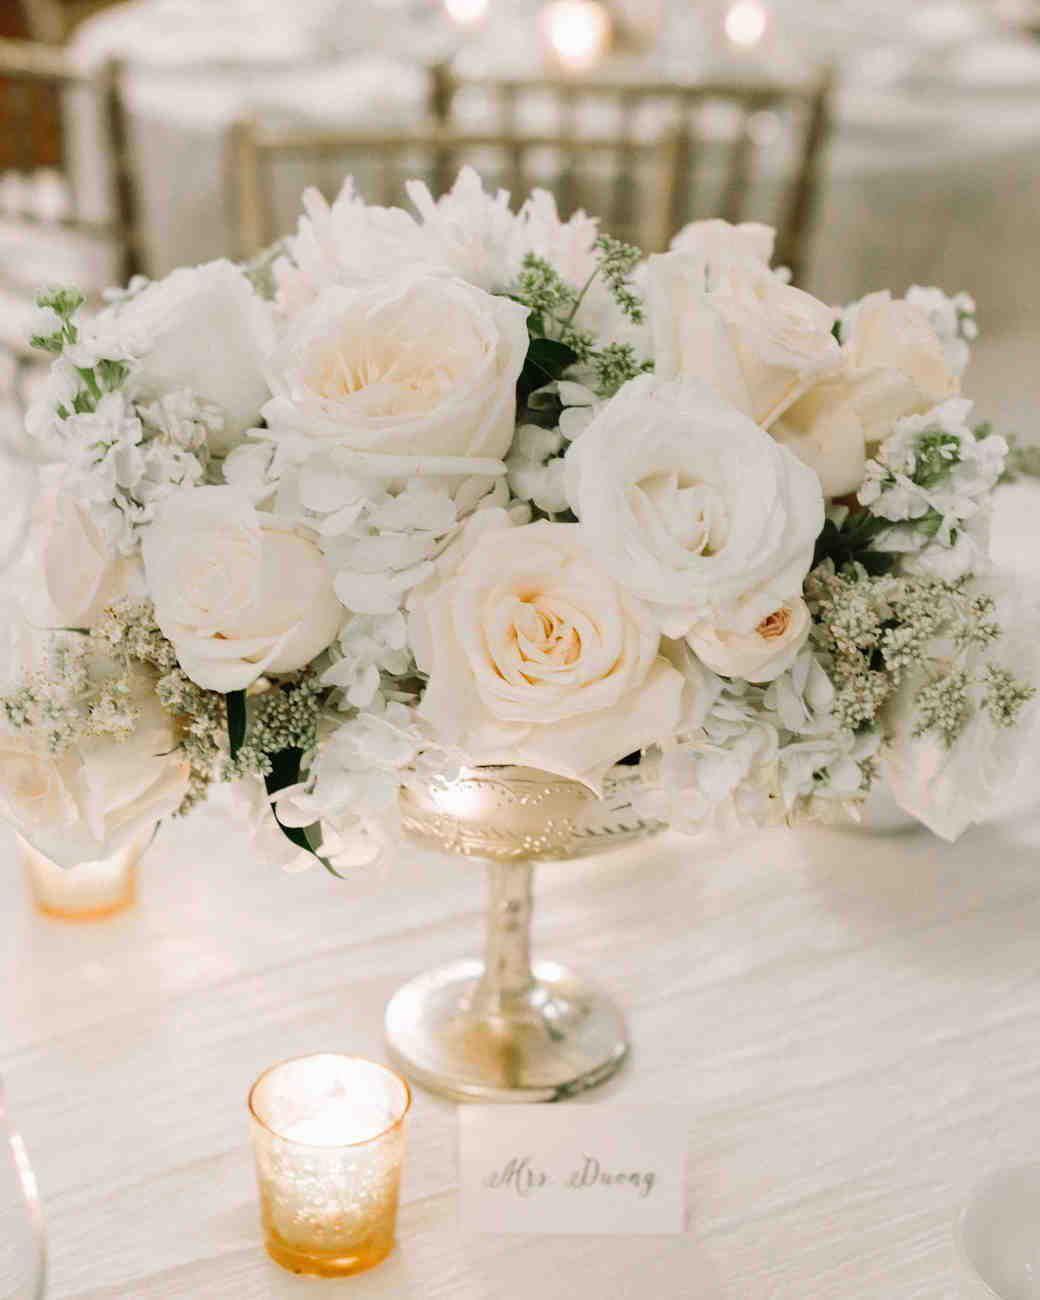 32 Classic Wedding Centerpieces We Love Wedding Floral Centerpieces Flower Centerpieces Wedding Classic Wedding Centerpieces